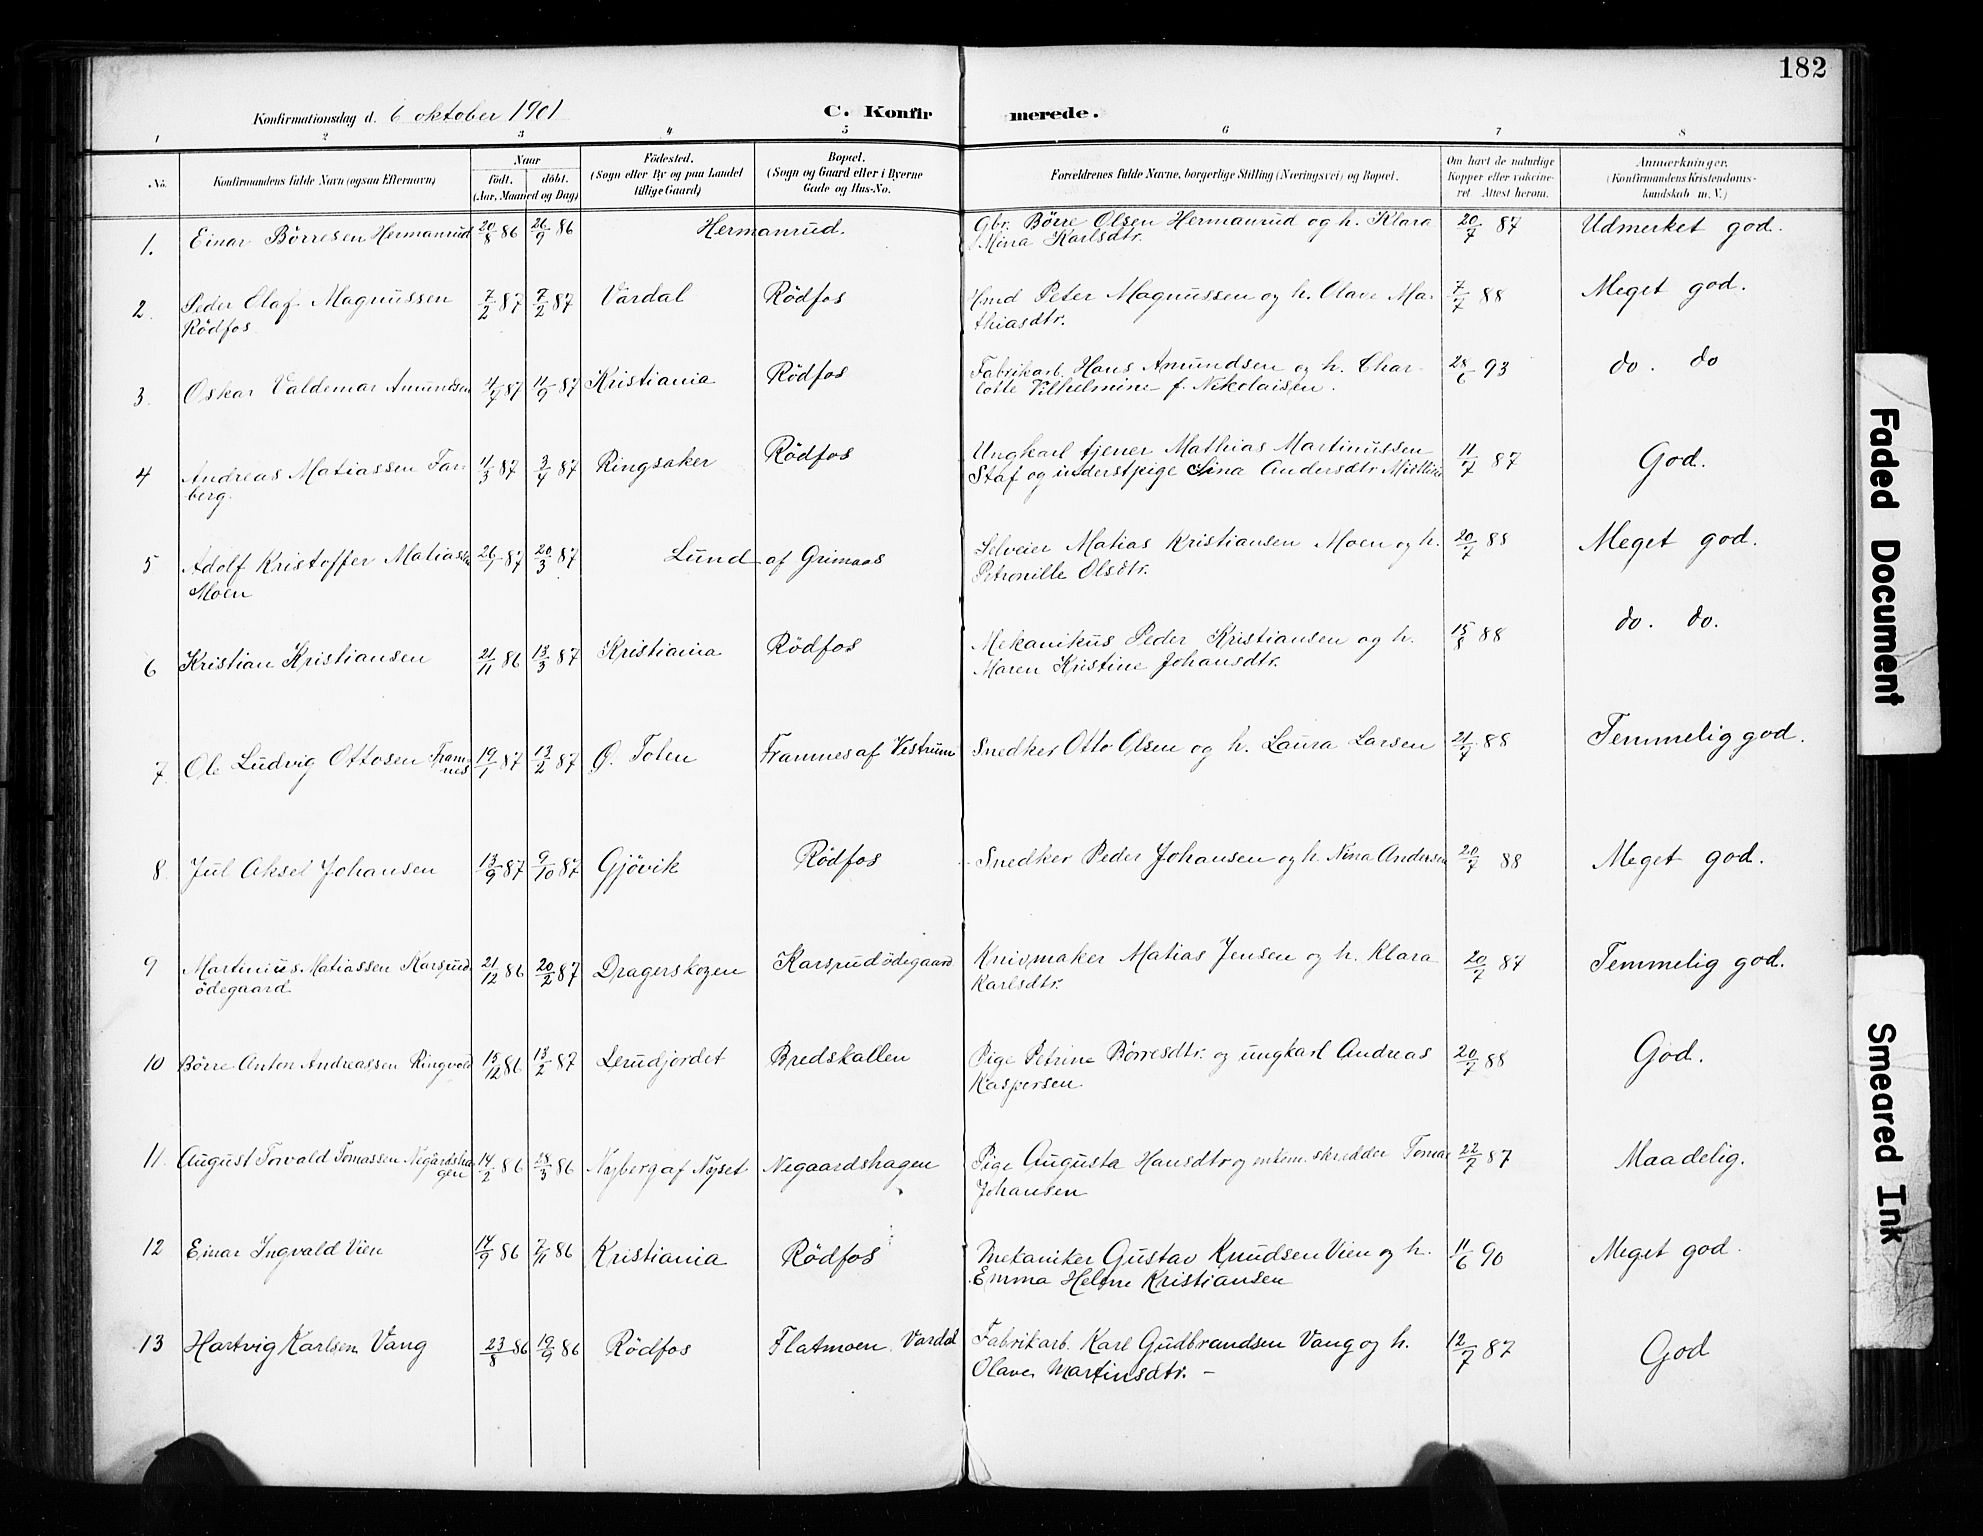 SAH, Vestre Toten prestekontor, H/Ha/Haa/L0011: Ministerialbok nr. 11, 1895-1906, s. 182